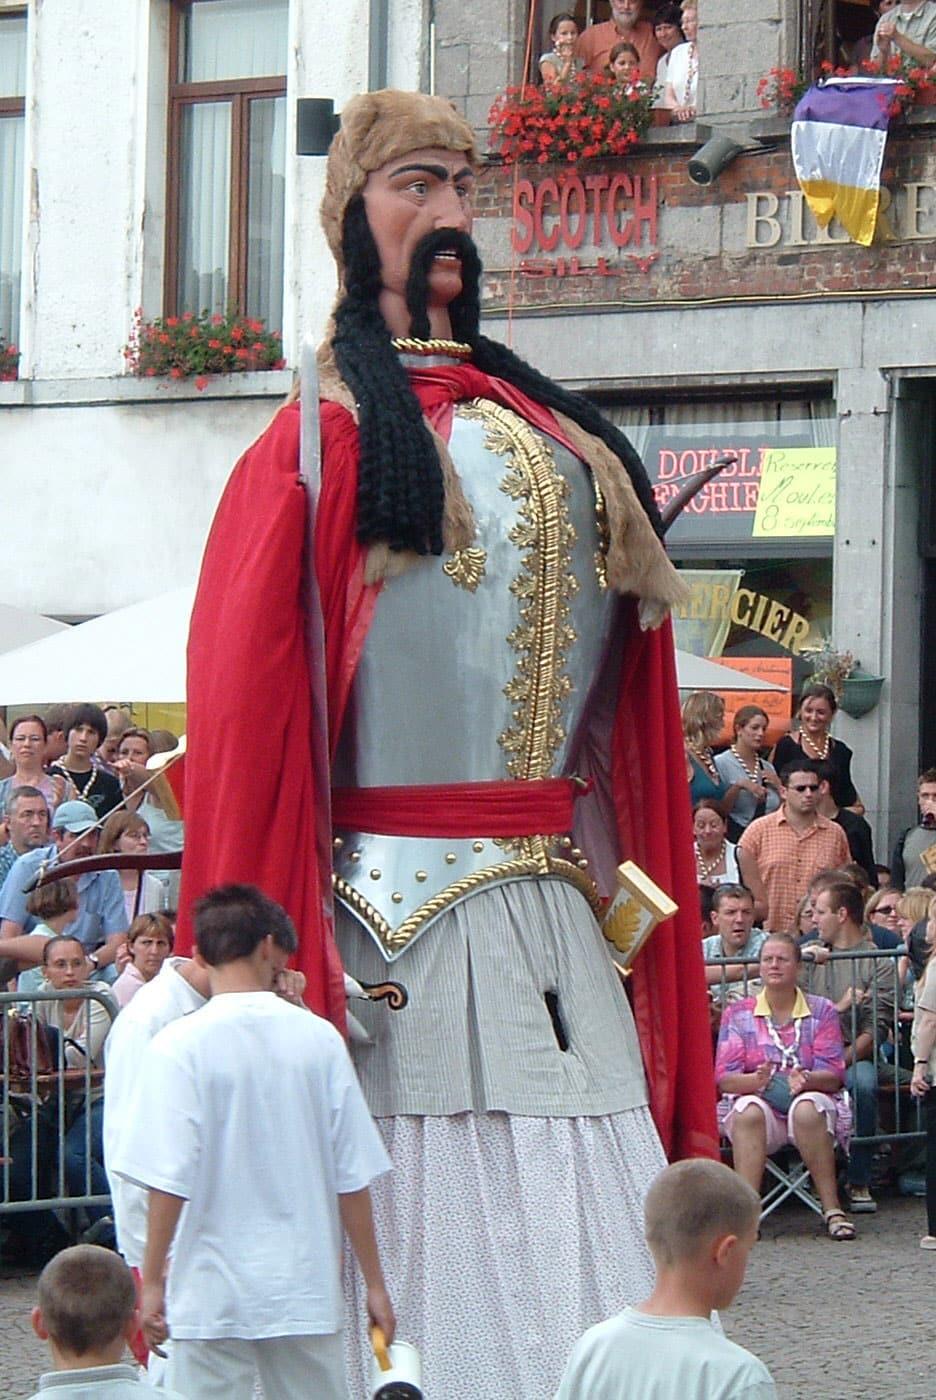 Image reprsentant Ambriorix de la Ducasse d'Ath